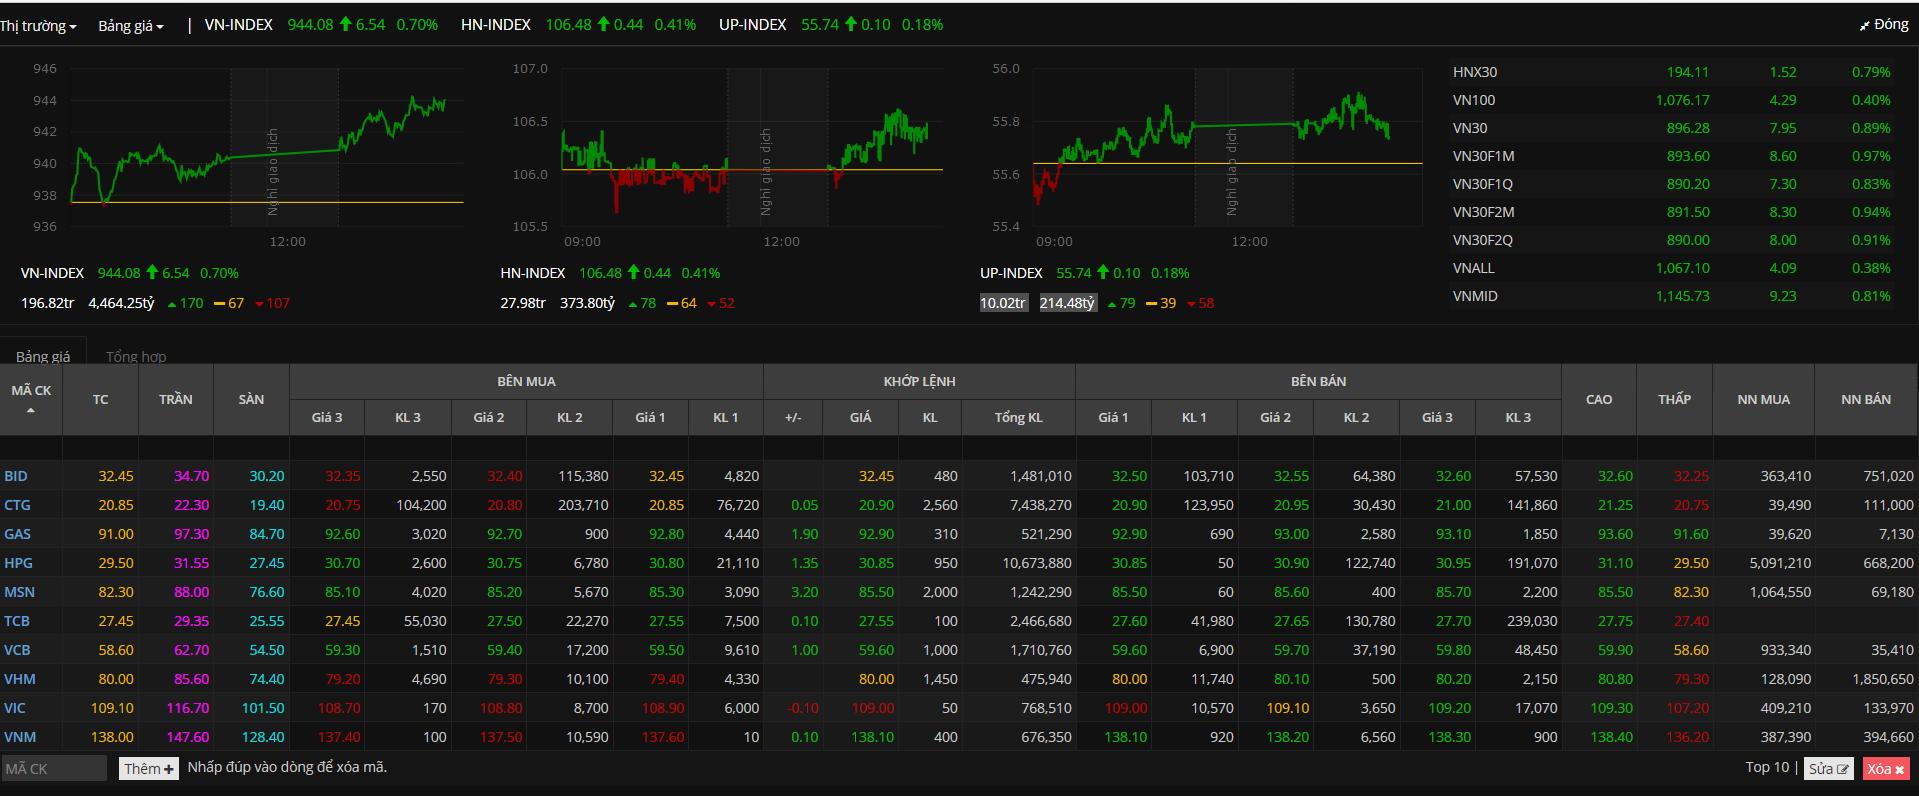 Danh mục cổ phiếu trụ